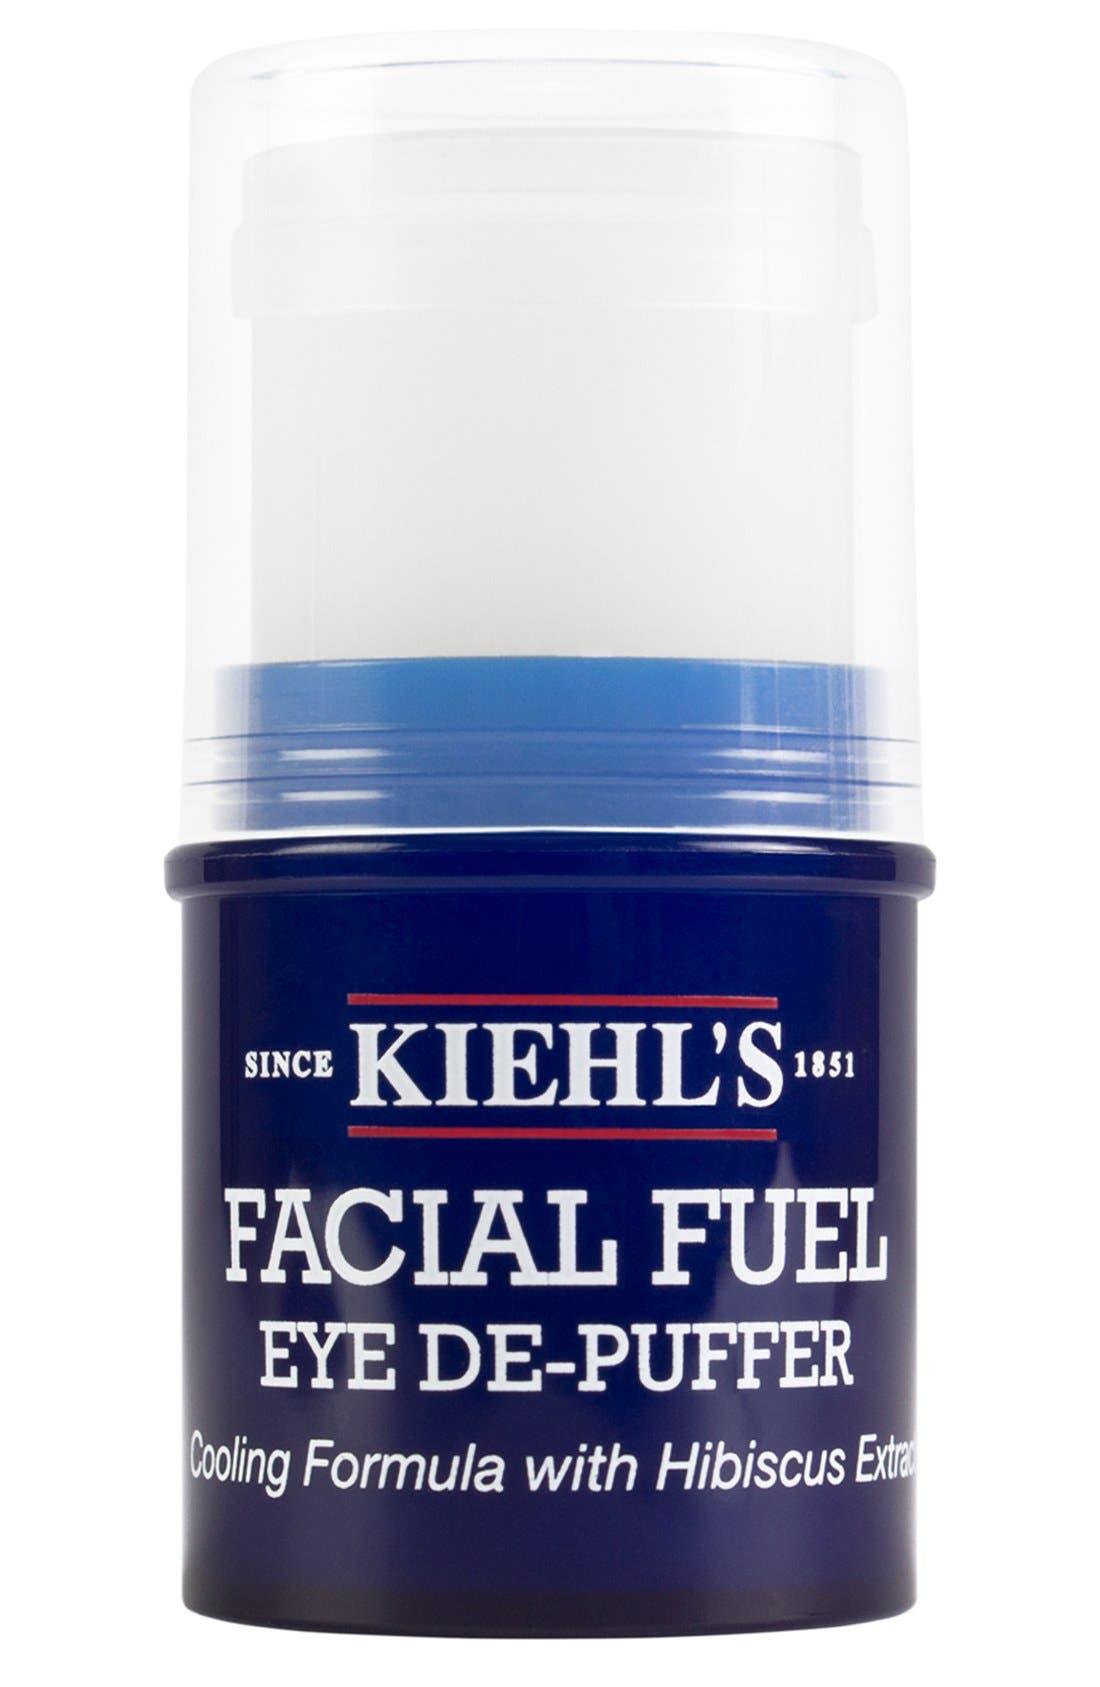 1851 Facial Fuel Eye De-Puffer Eye Treatment